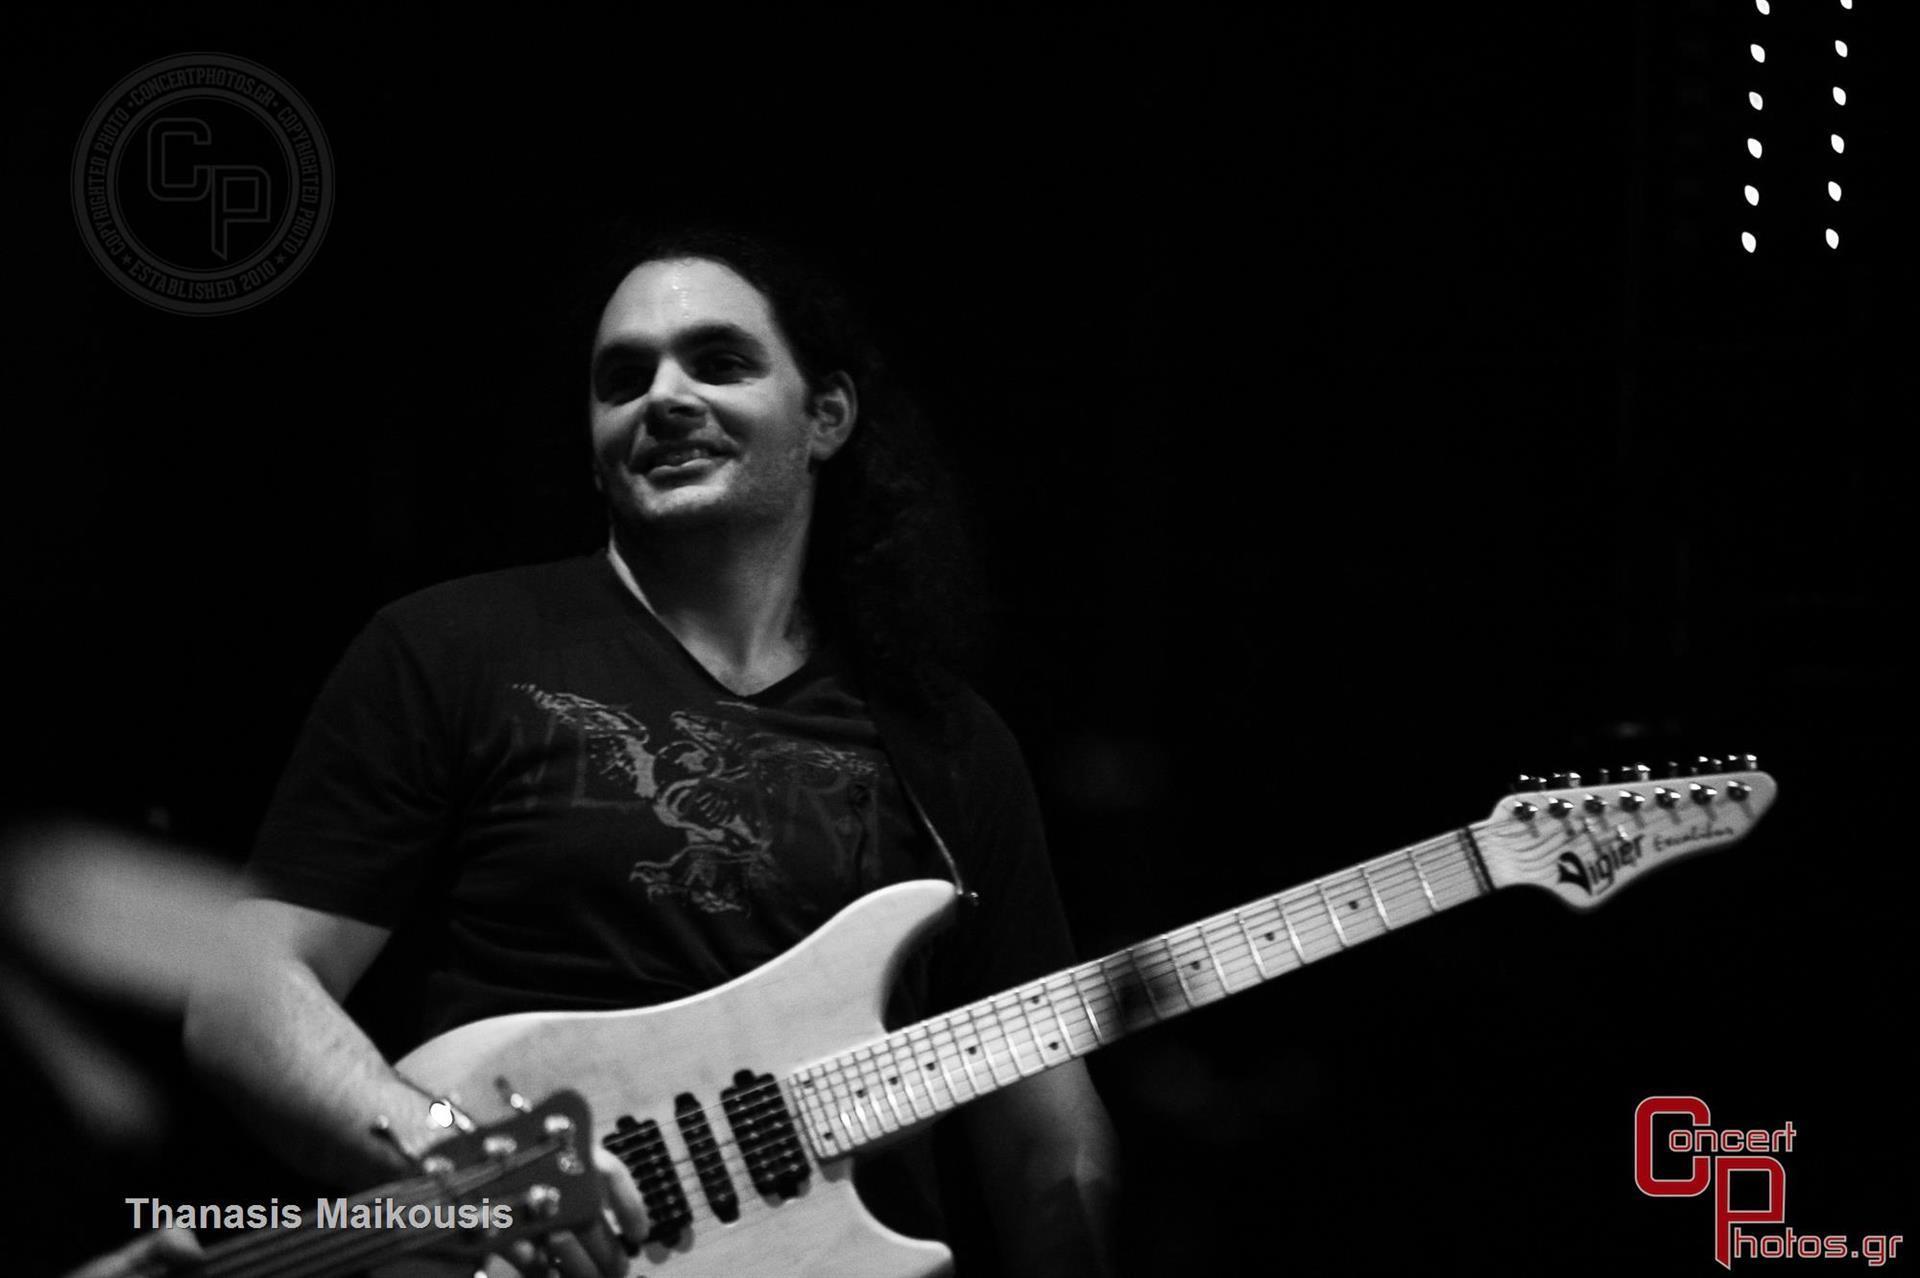 At The Gates-At The Gates Fuzz photographer: Thanasis Maikousis - ConcertPhotos - 20150109_2245_17